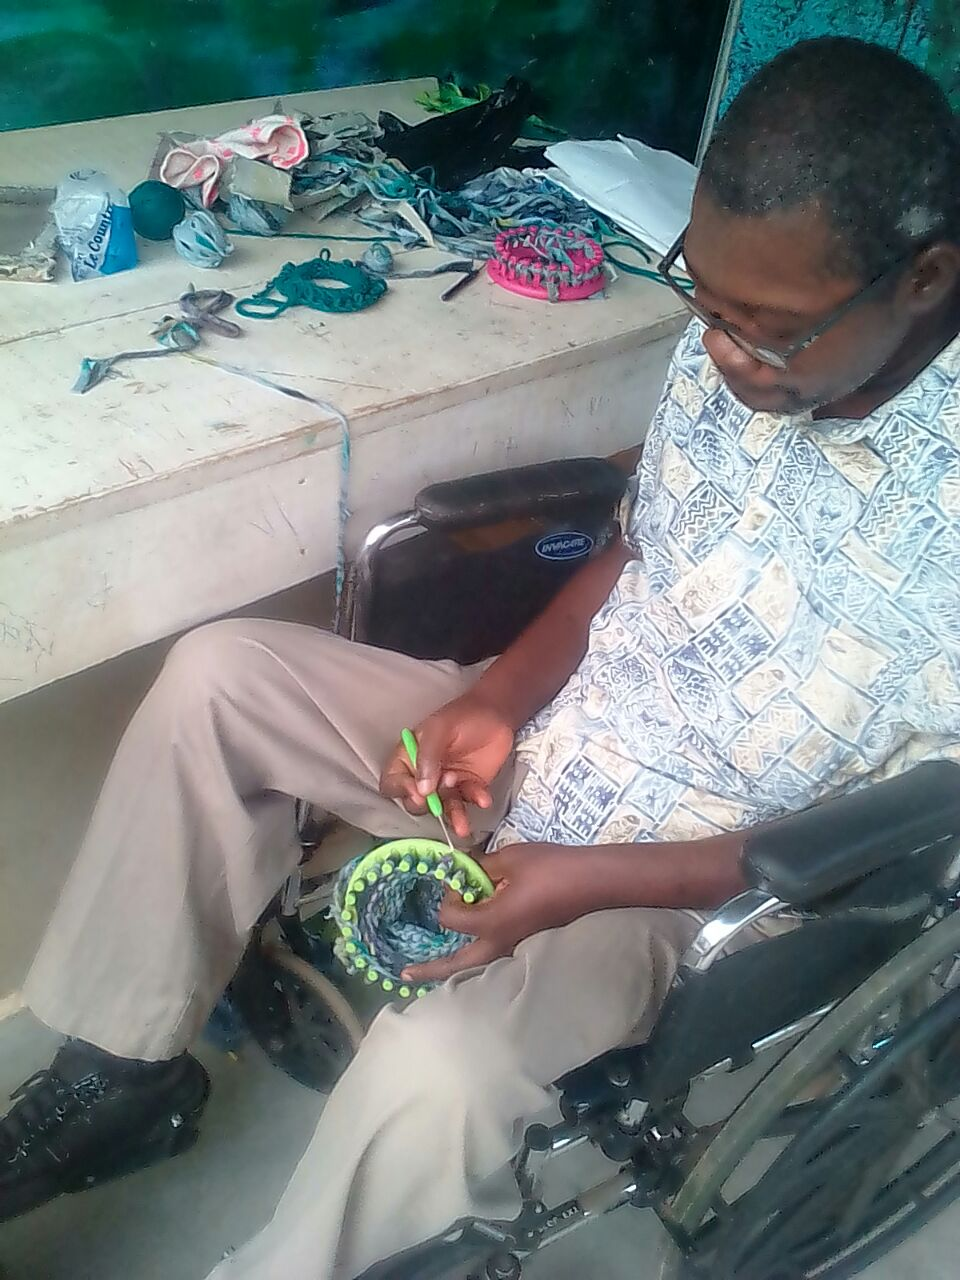 Knitter Visits Workshop for Mitten Training Session